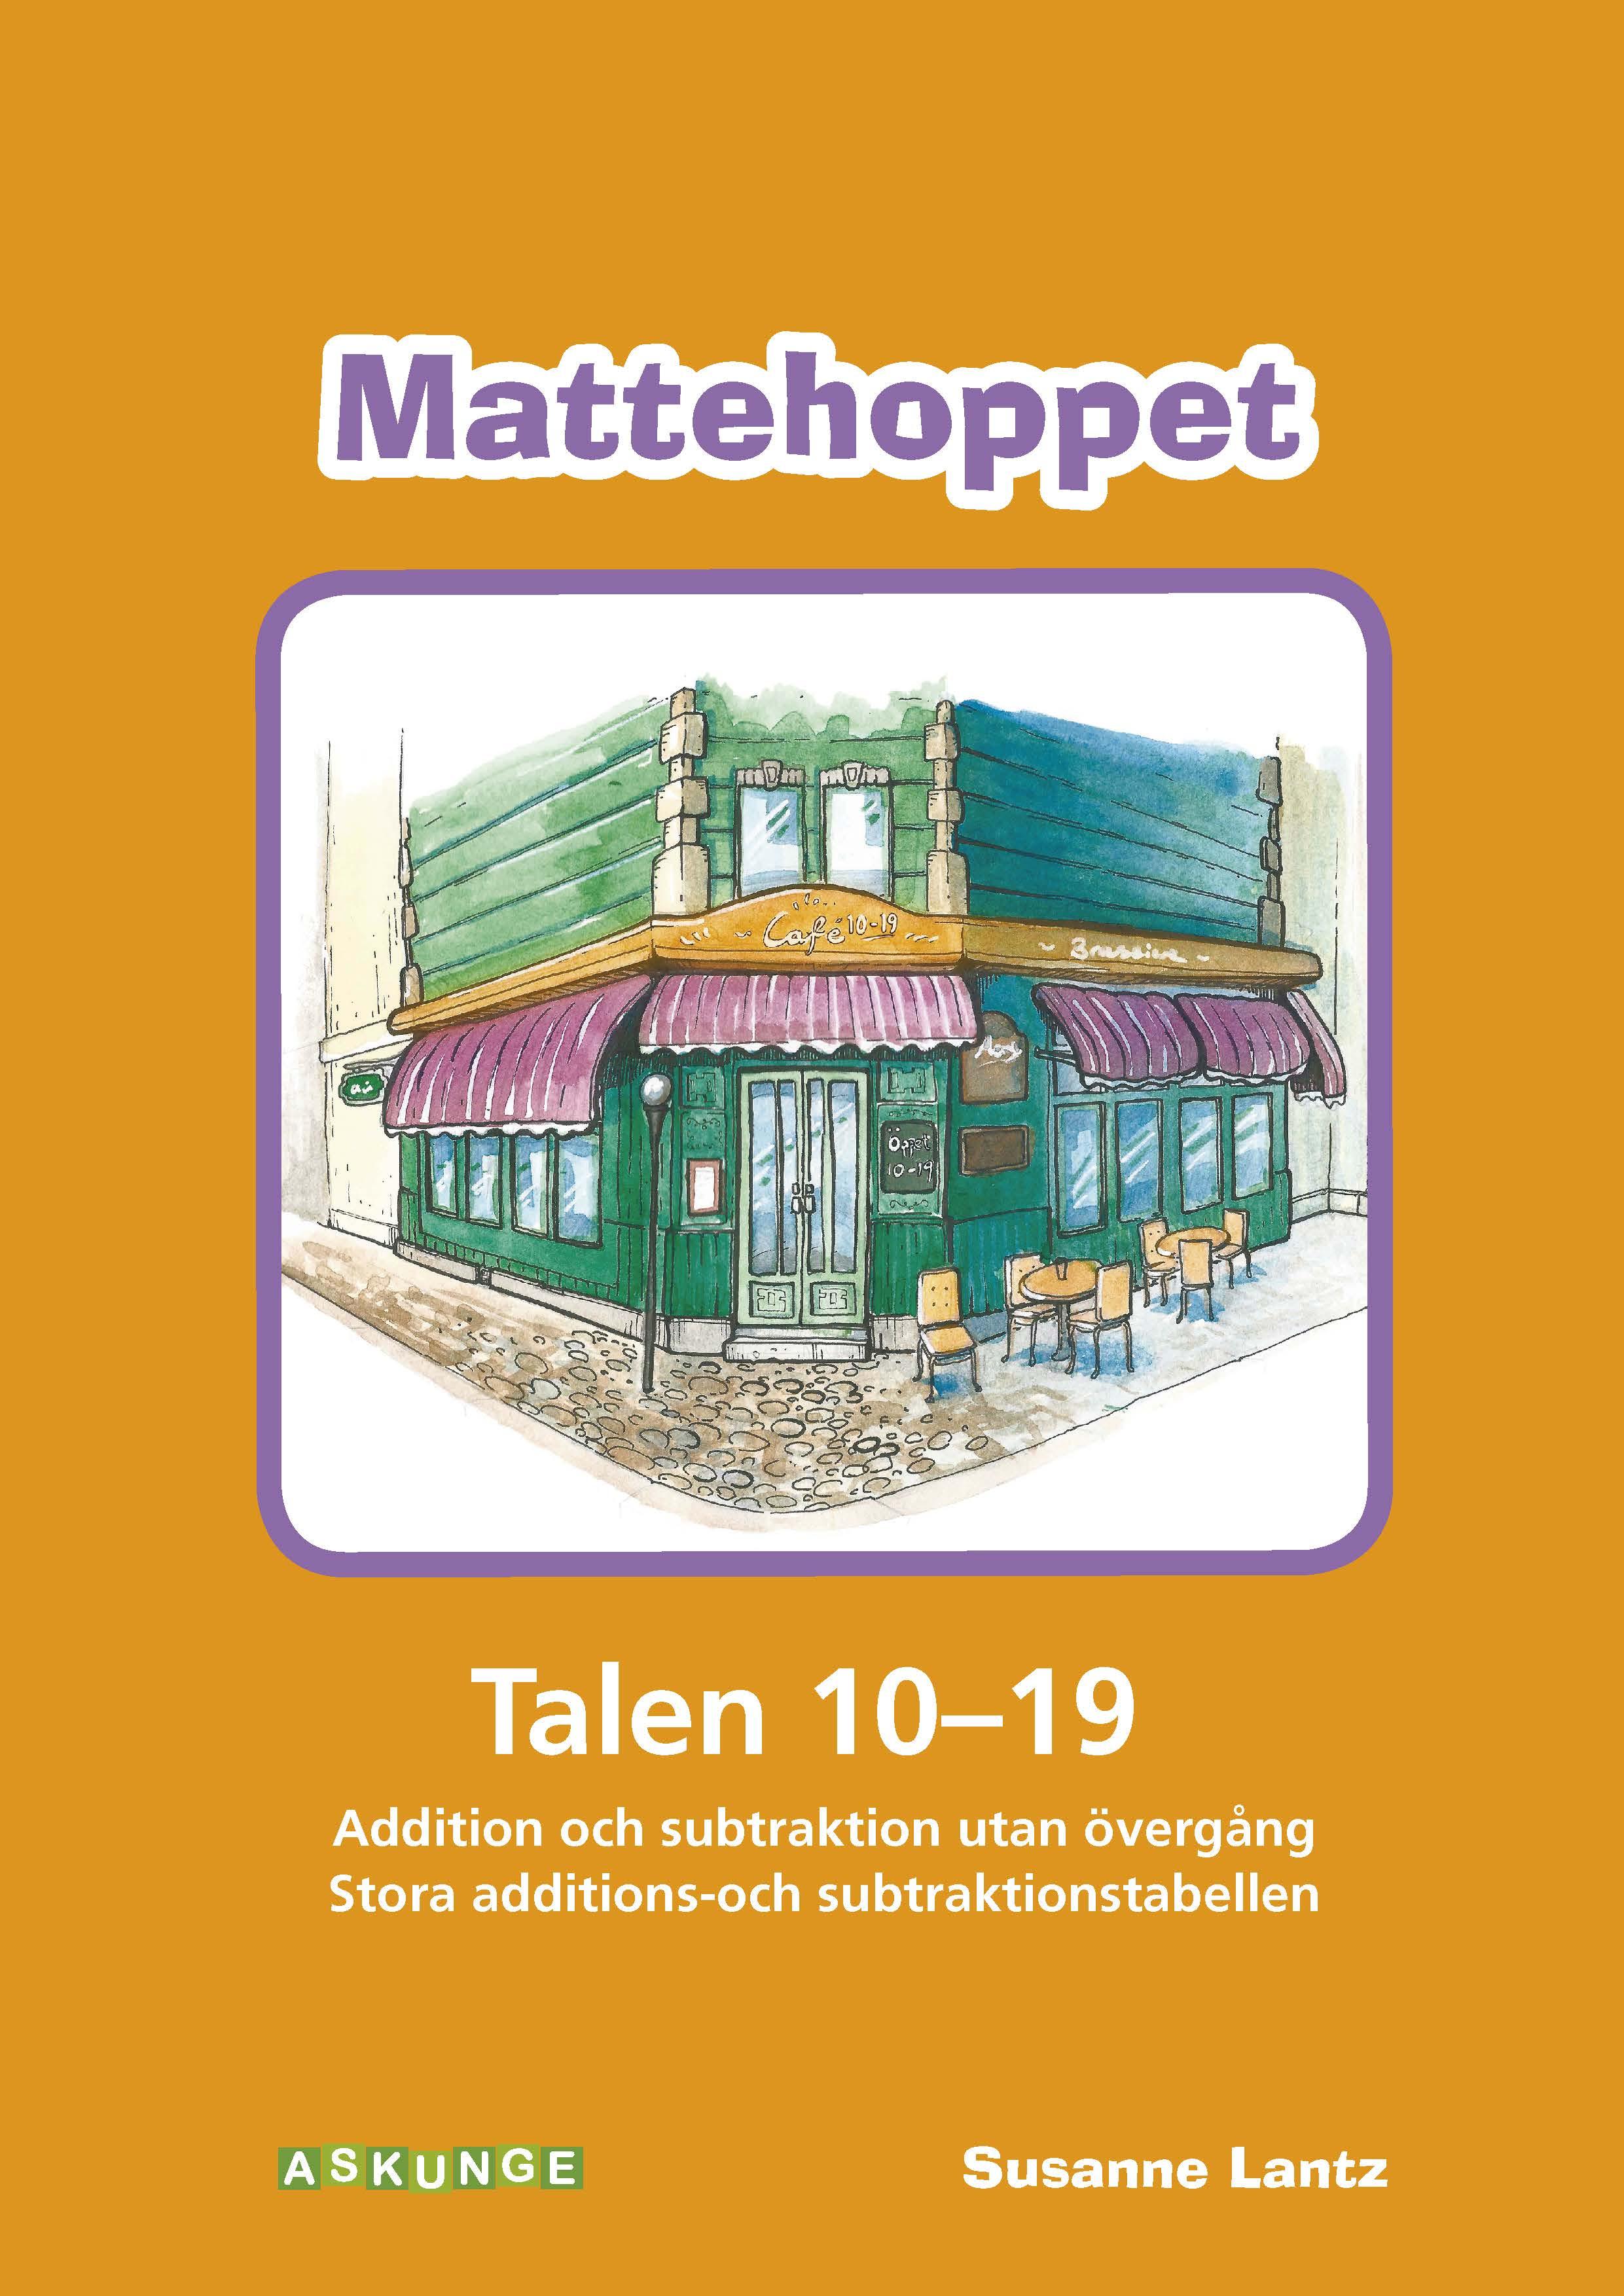 Mattehoppet EB Talen 10-19